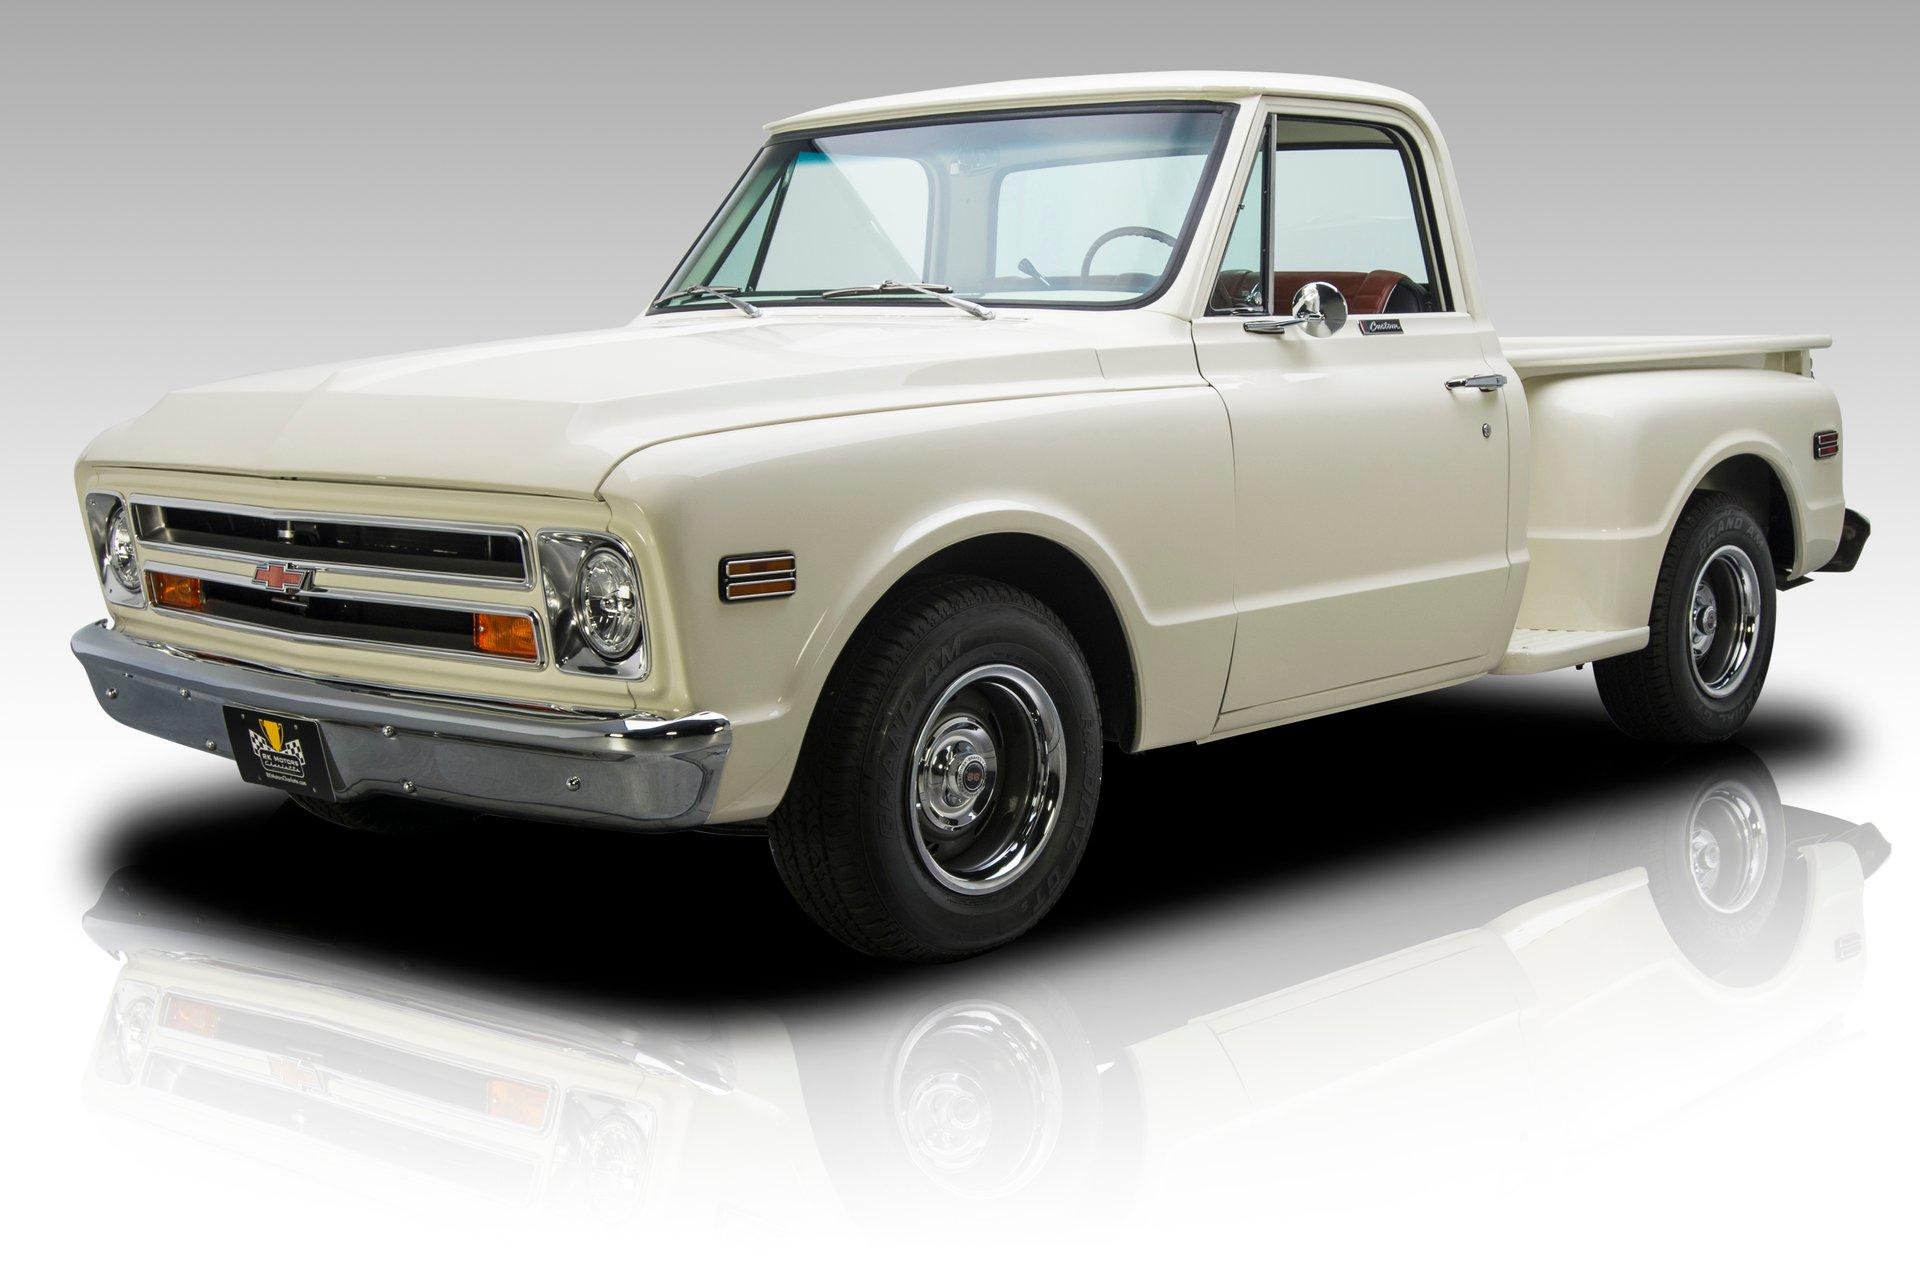 1967 chevrolet c10 pickup truck